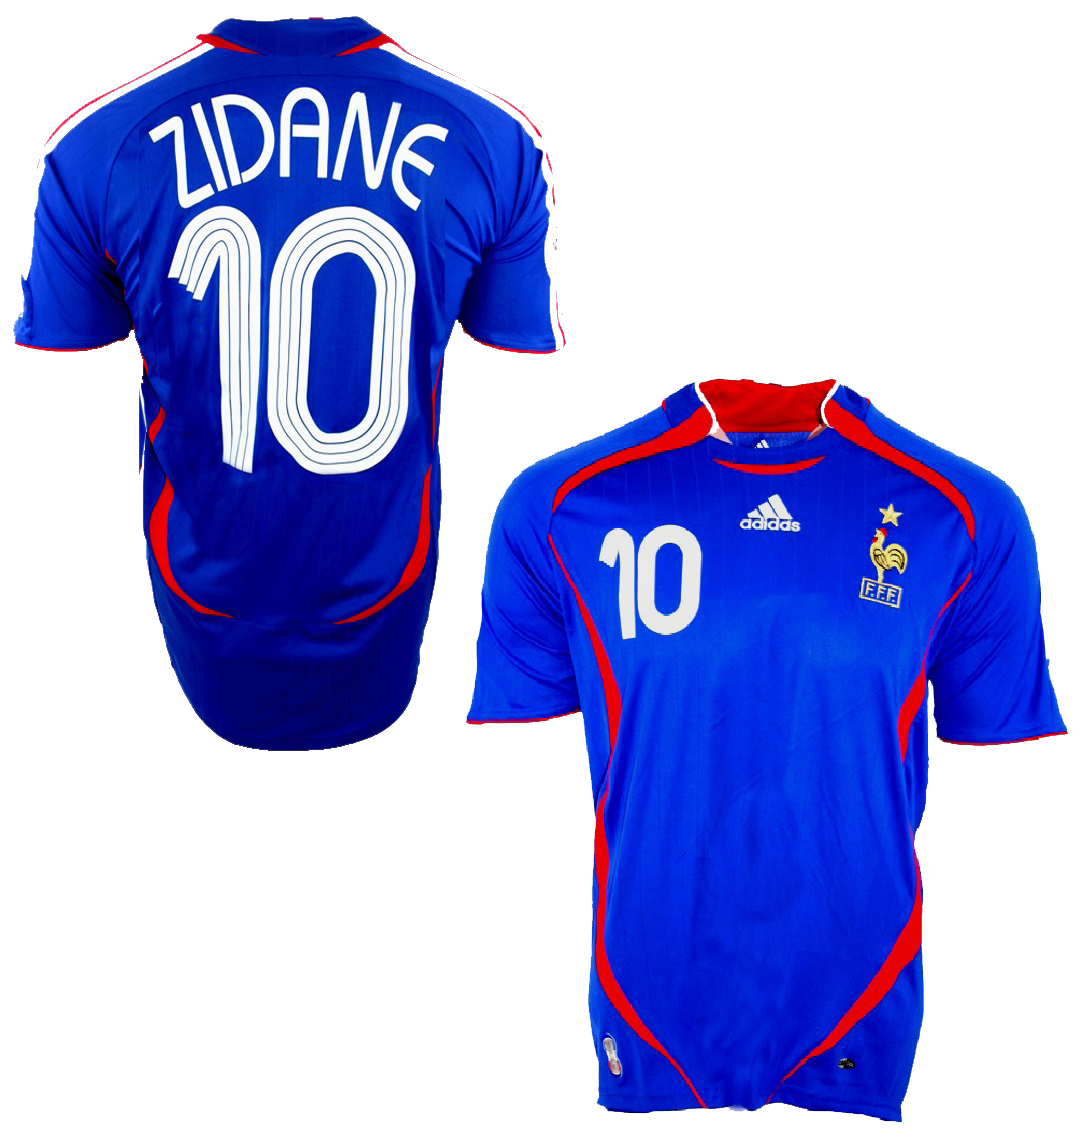 Adidas France jersey 10 Zinedine Zidane WC 2006 Mens XS S M L XL XXL ... 946ac523a